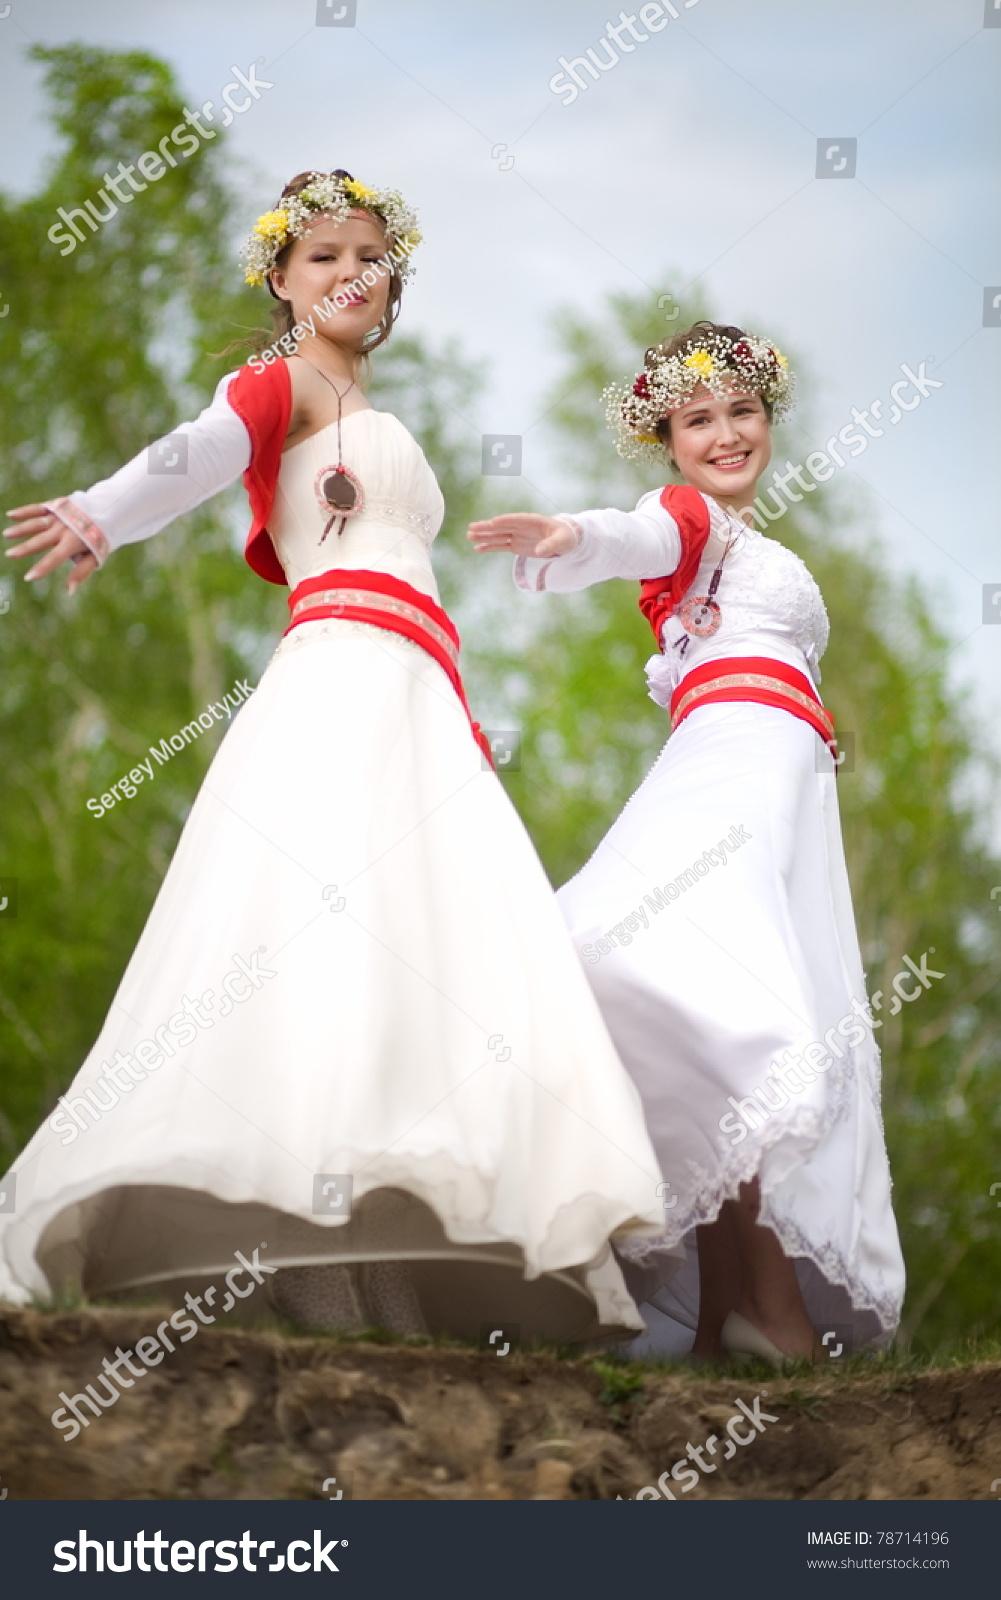 Bride Stylized Russian Style Wedding Dress Stock Photo (100% Legal ...